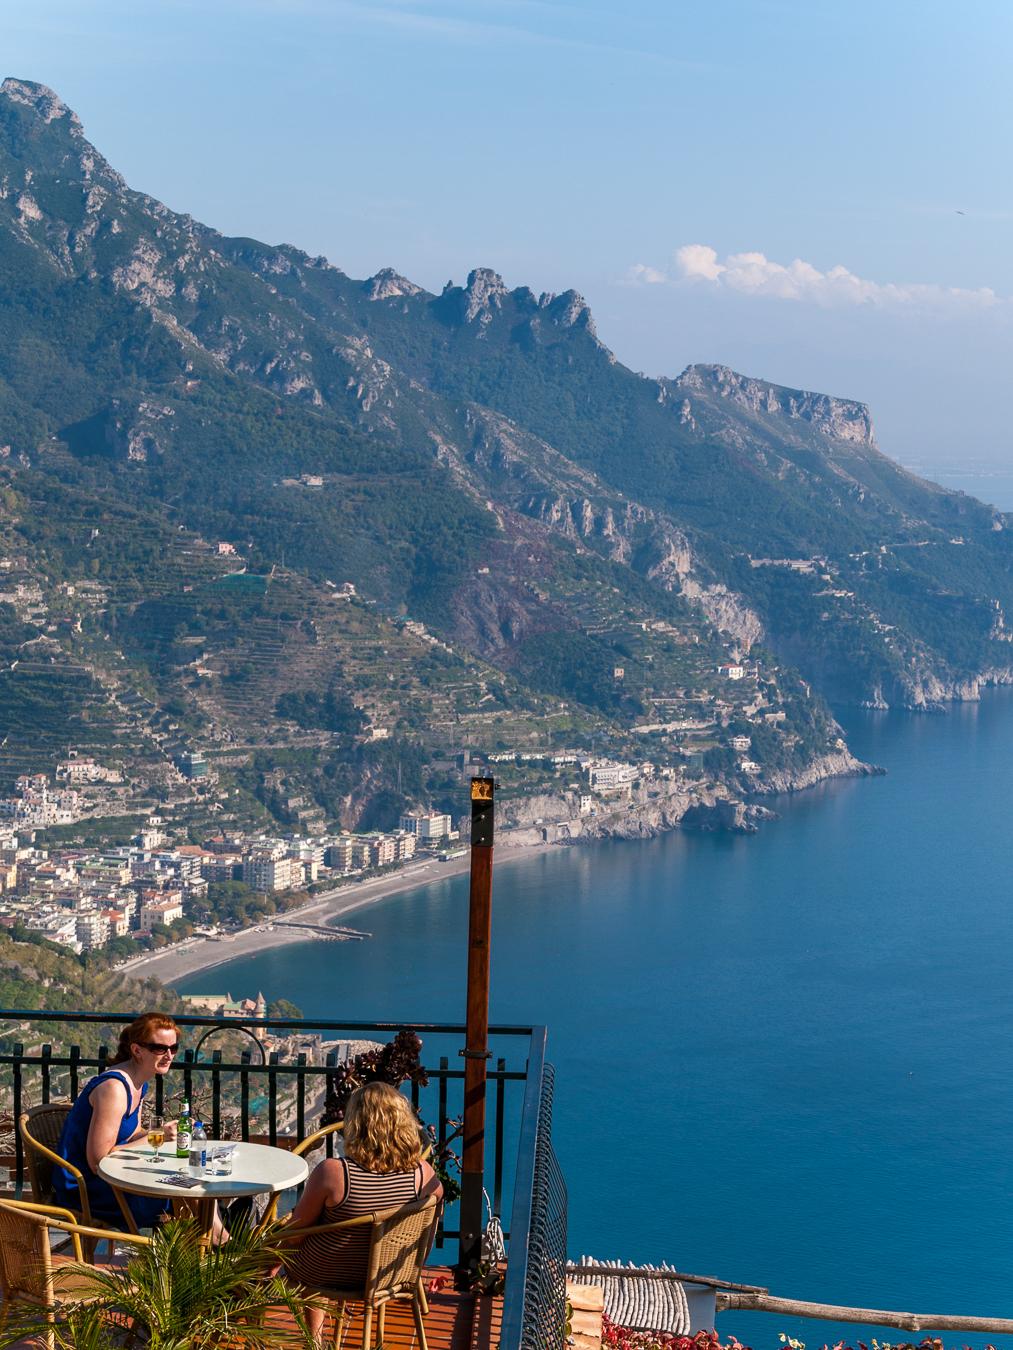 Al fresco dining on the Isle of Capri